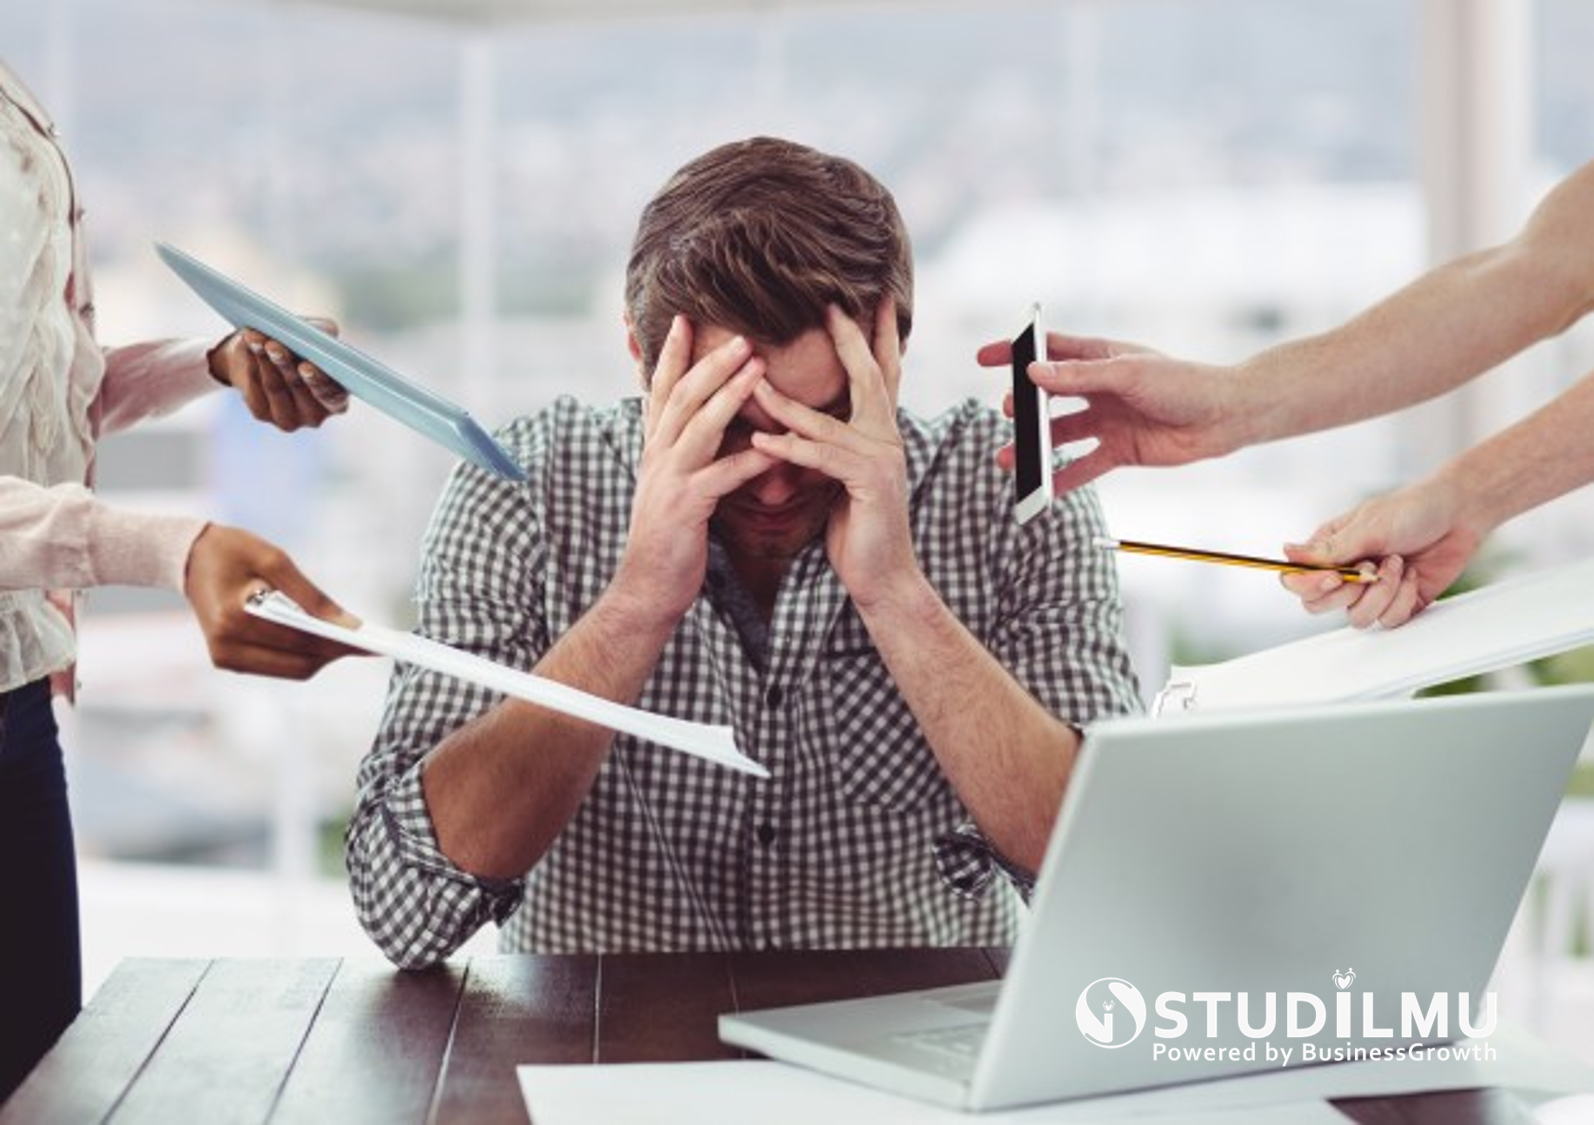 STUDILMU Career Advice - 7 Cara Mengatasi Stres Kerja